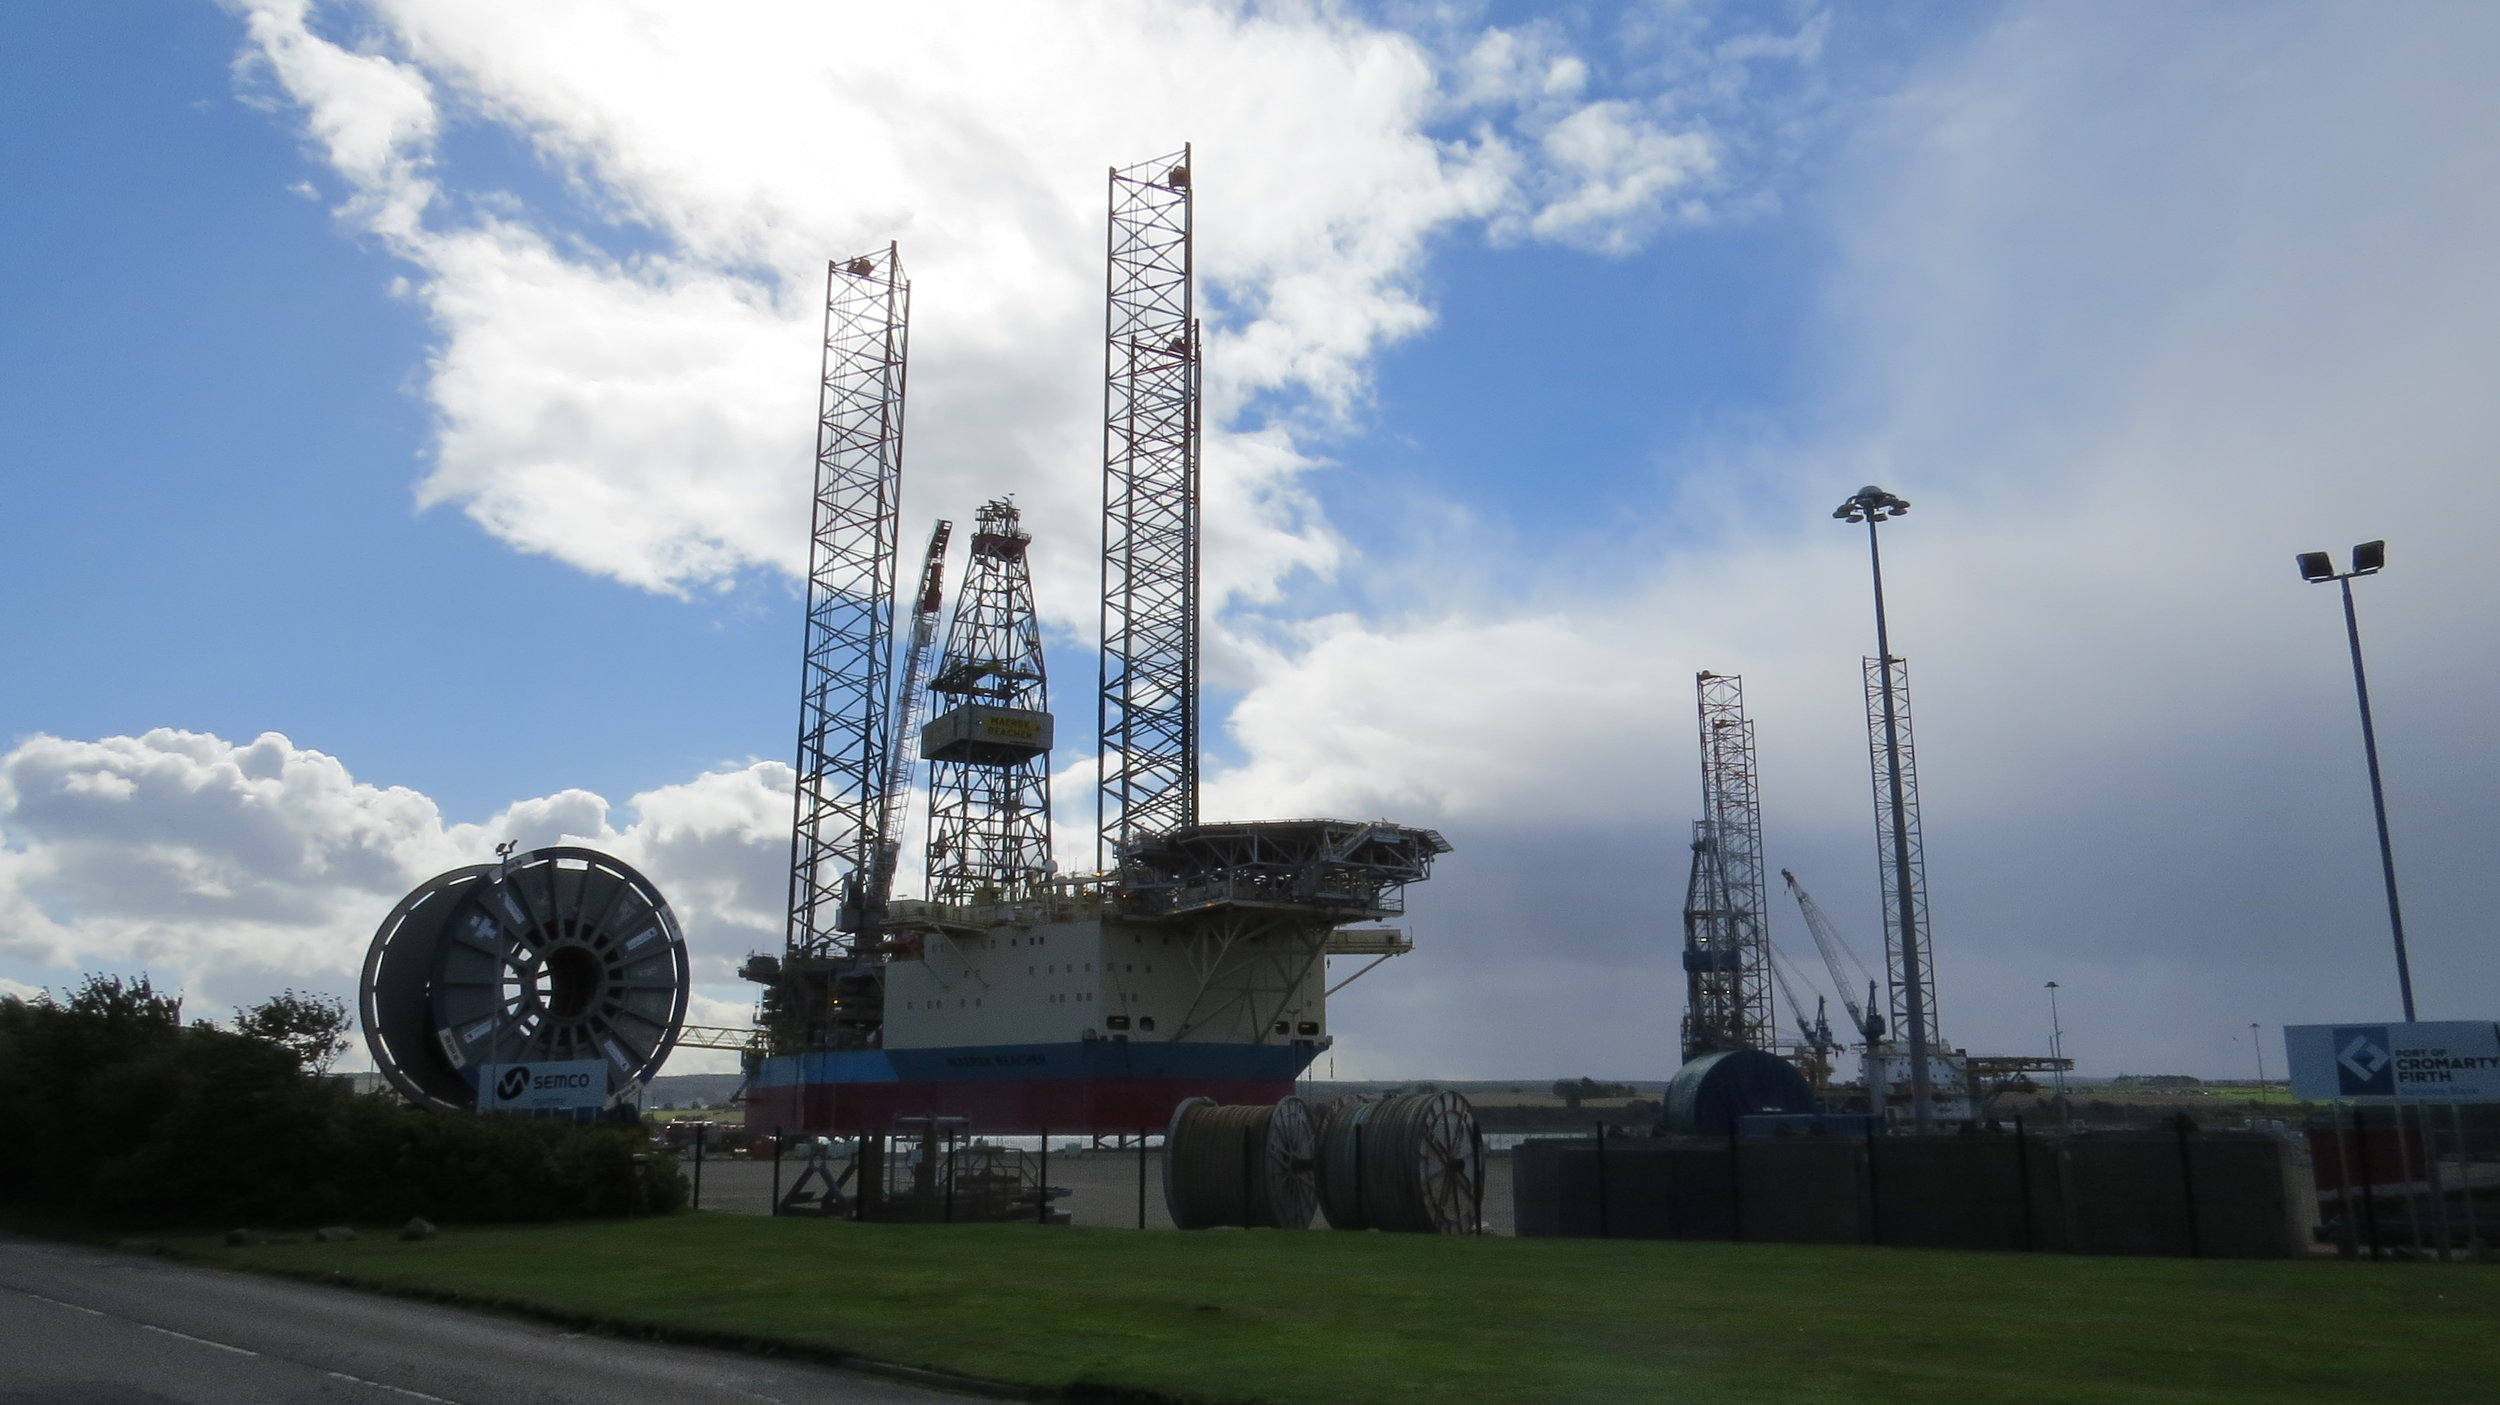 Industry on Outskirts of Invergordon